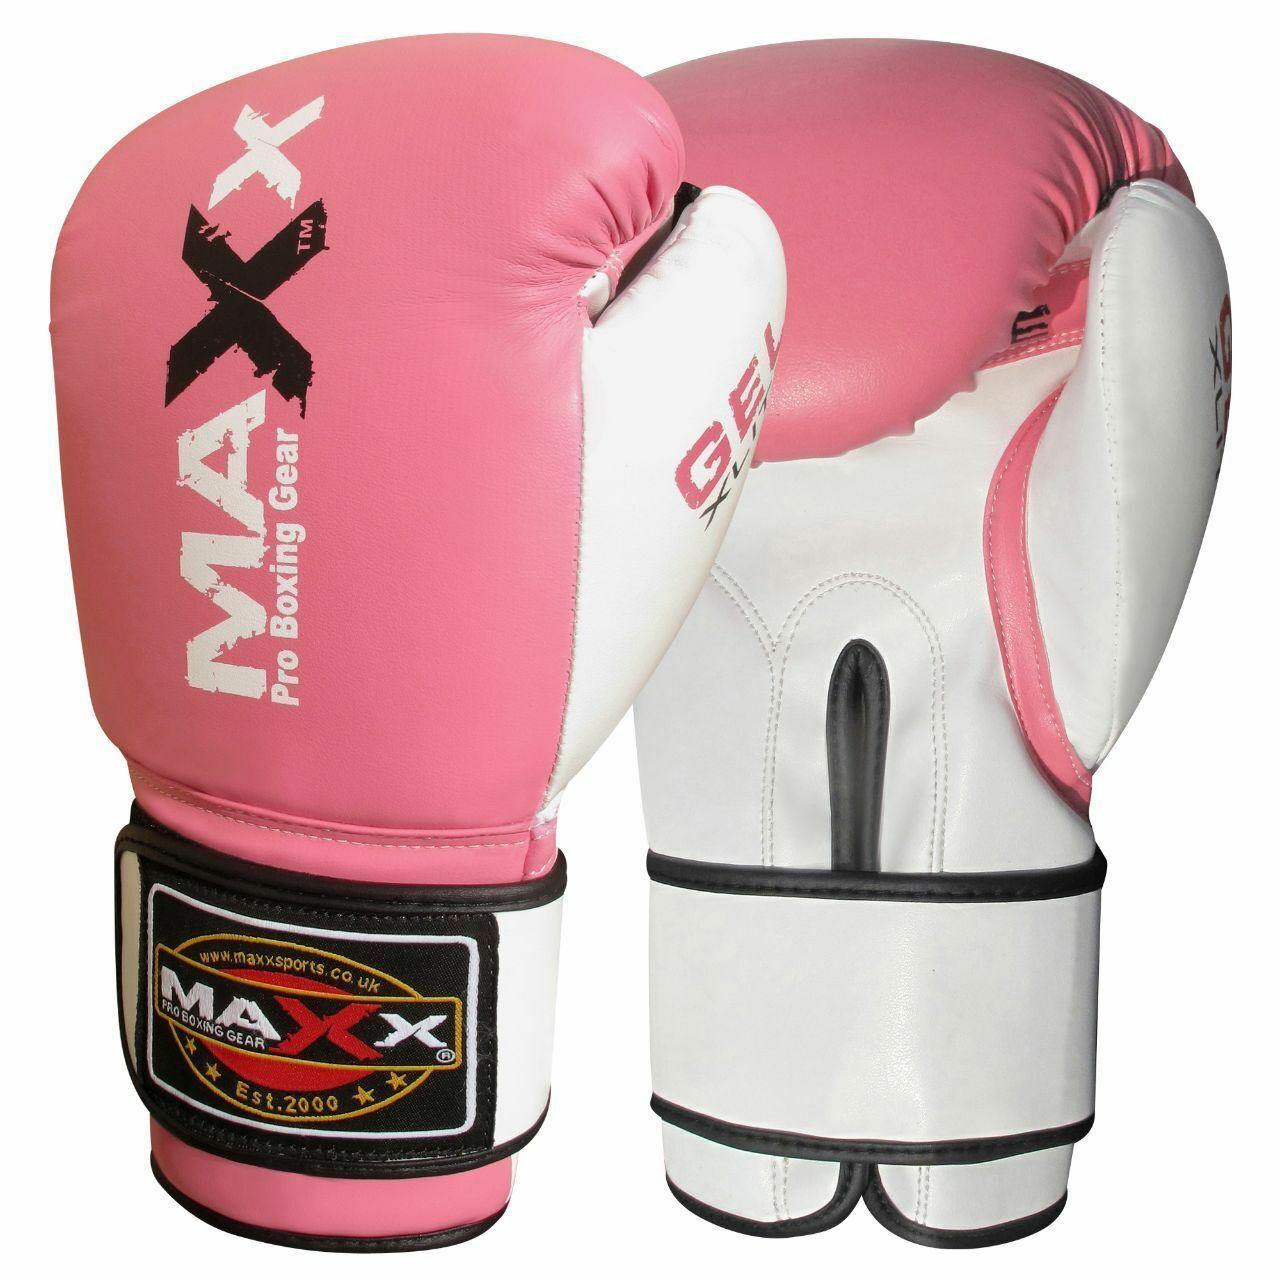 Lockdown Fightwear MMA Gloves Fight Grappling Sparring Green Camo Size S-XL